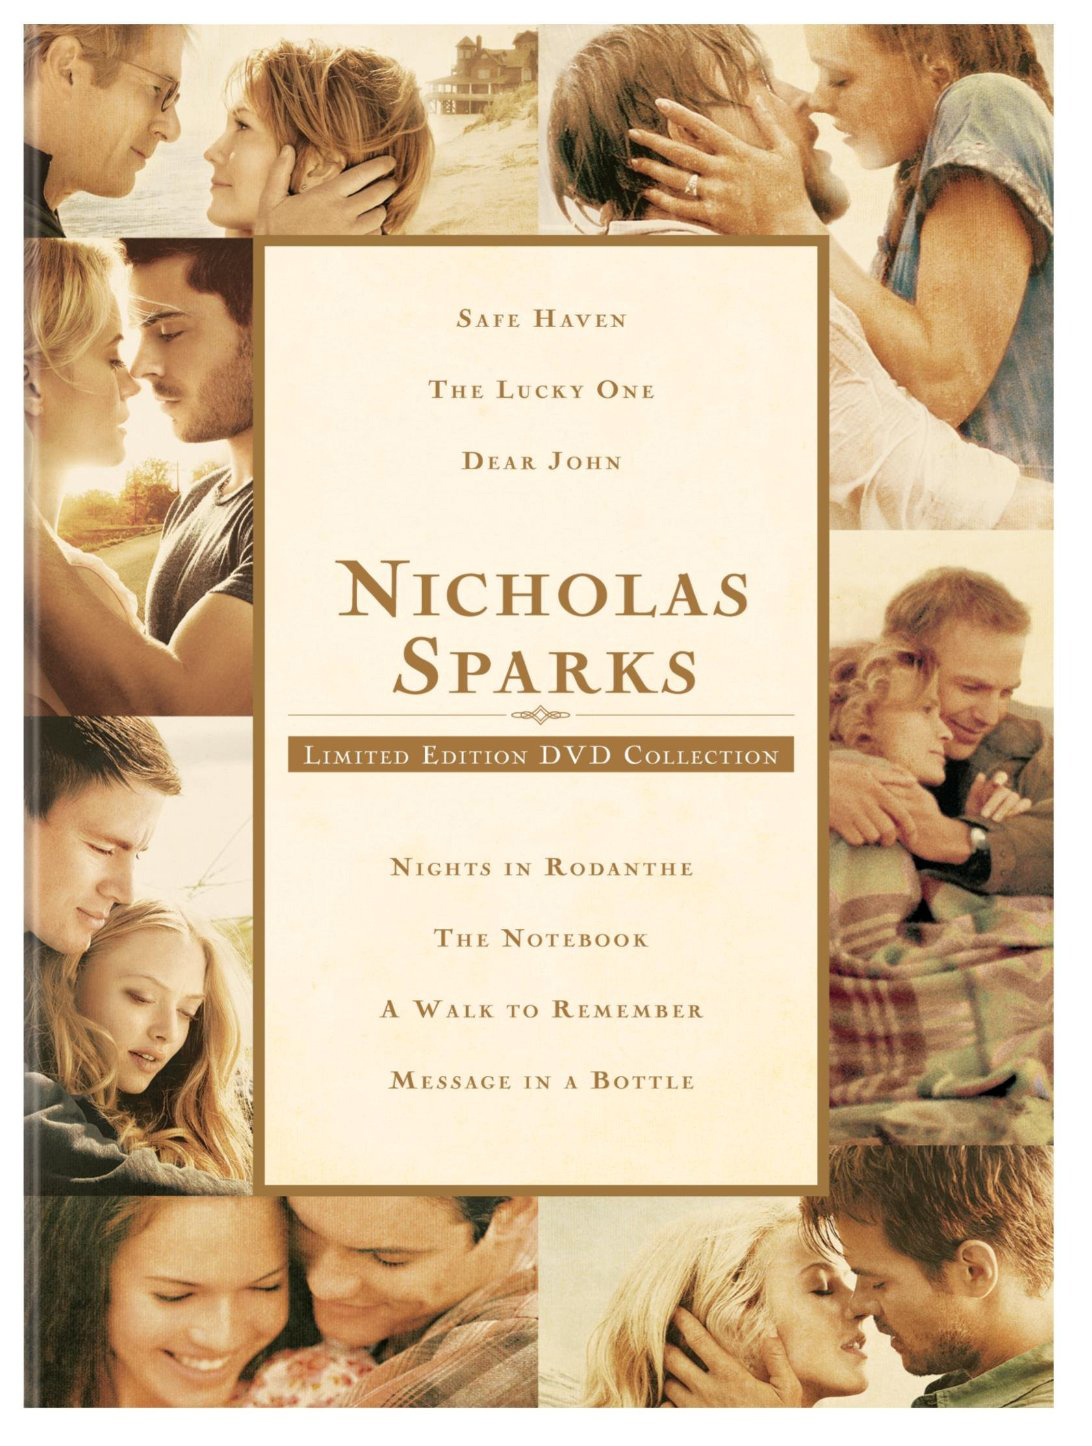 Nicholas Sparks DVD Collection | Family Choice Awards